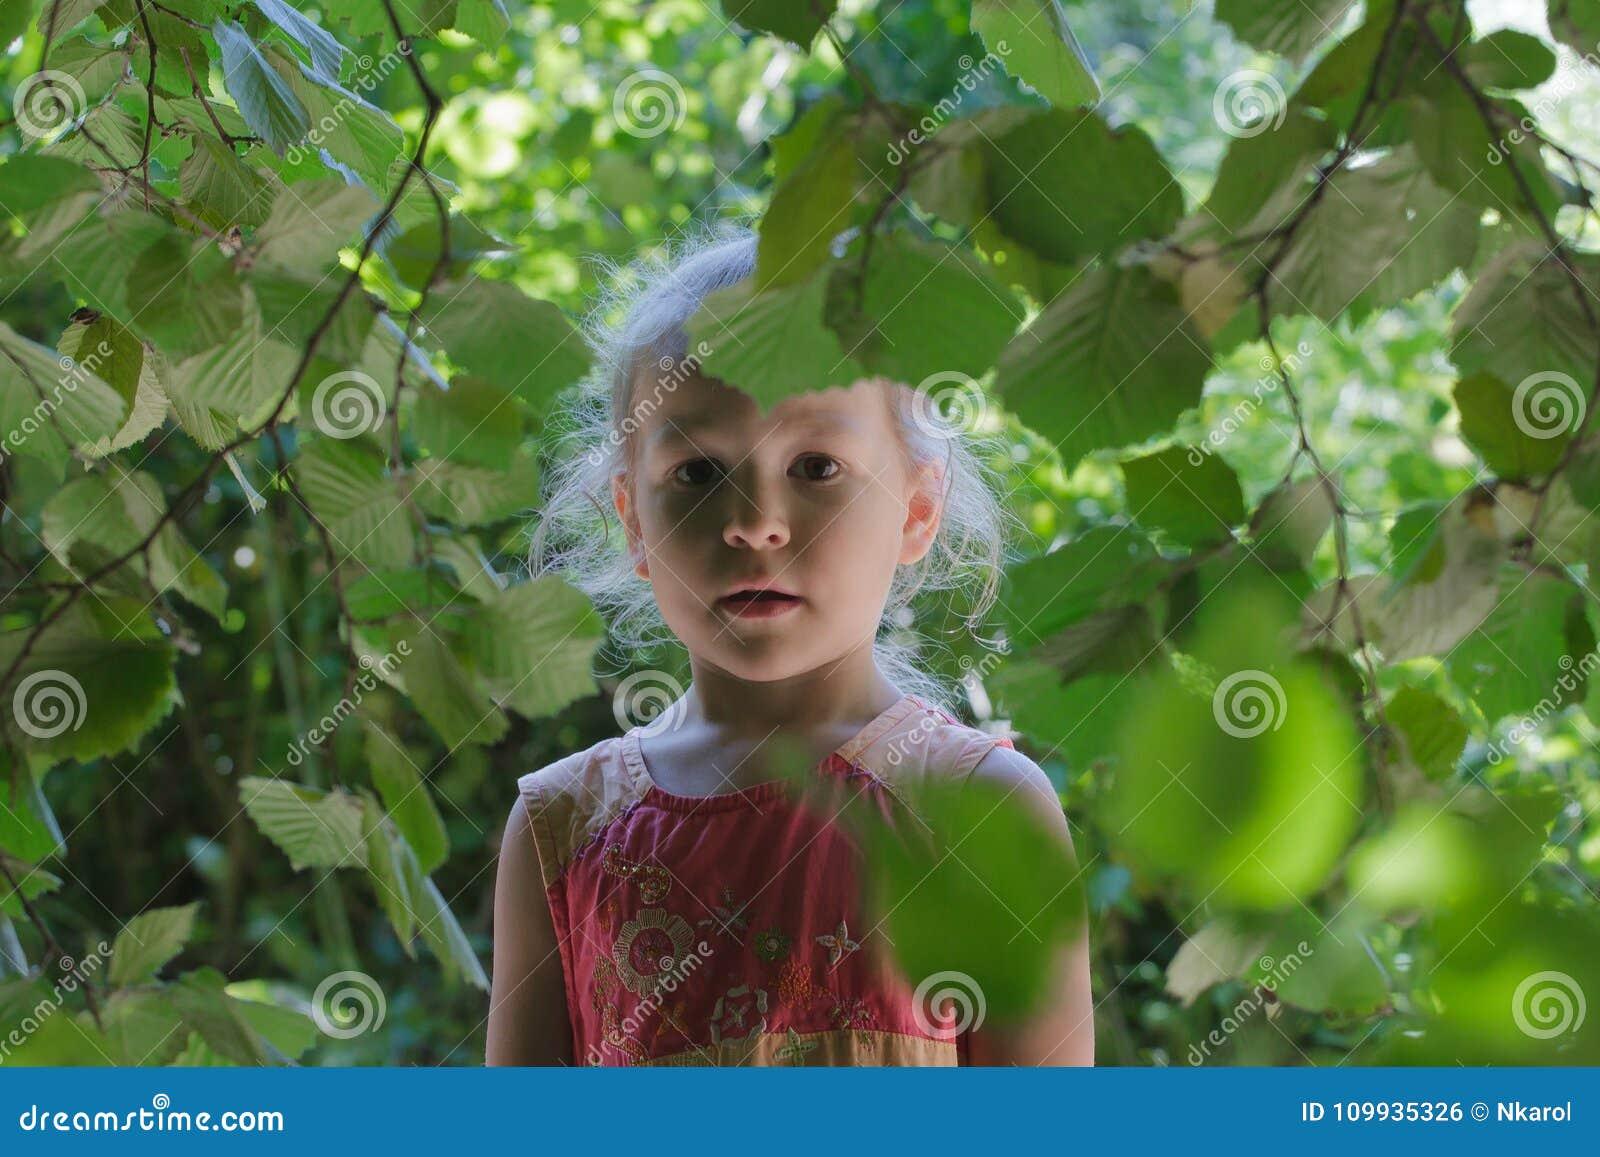 Little girl adventure in common hazel shrubbery hedgerow